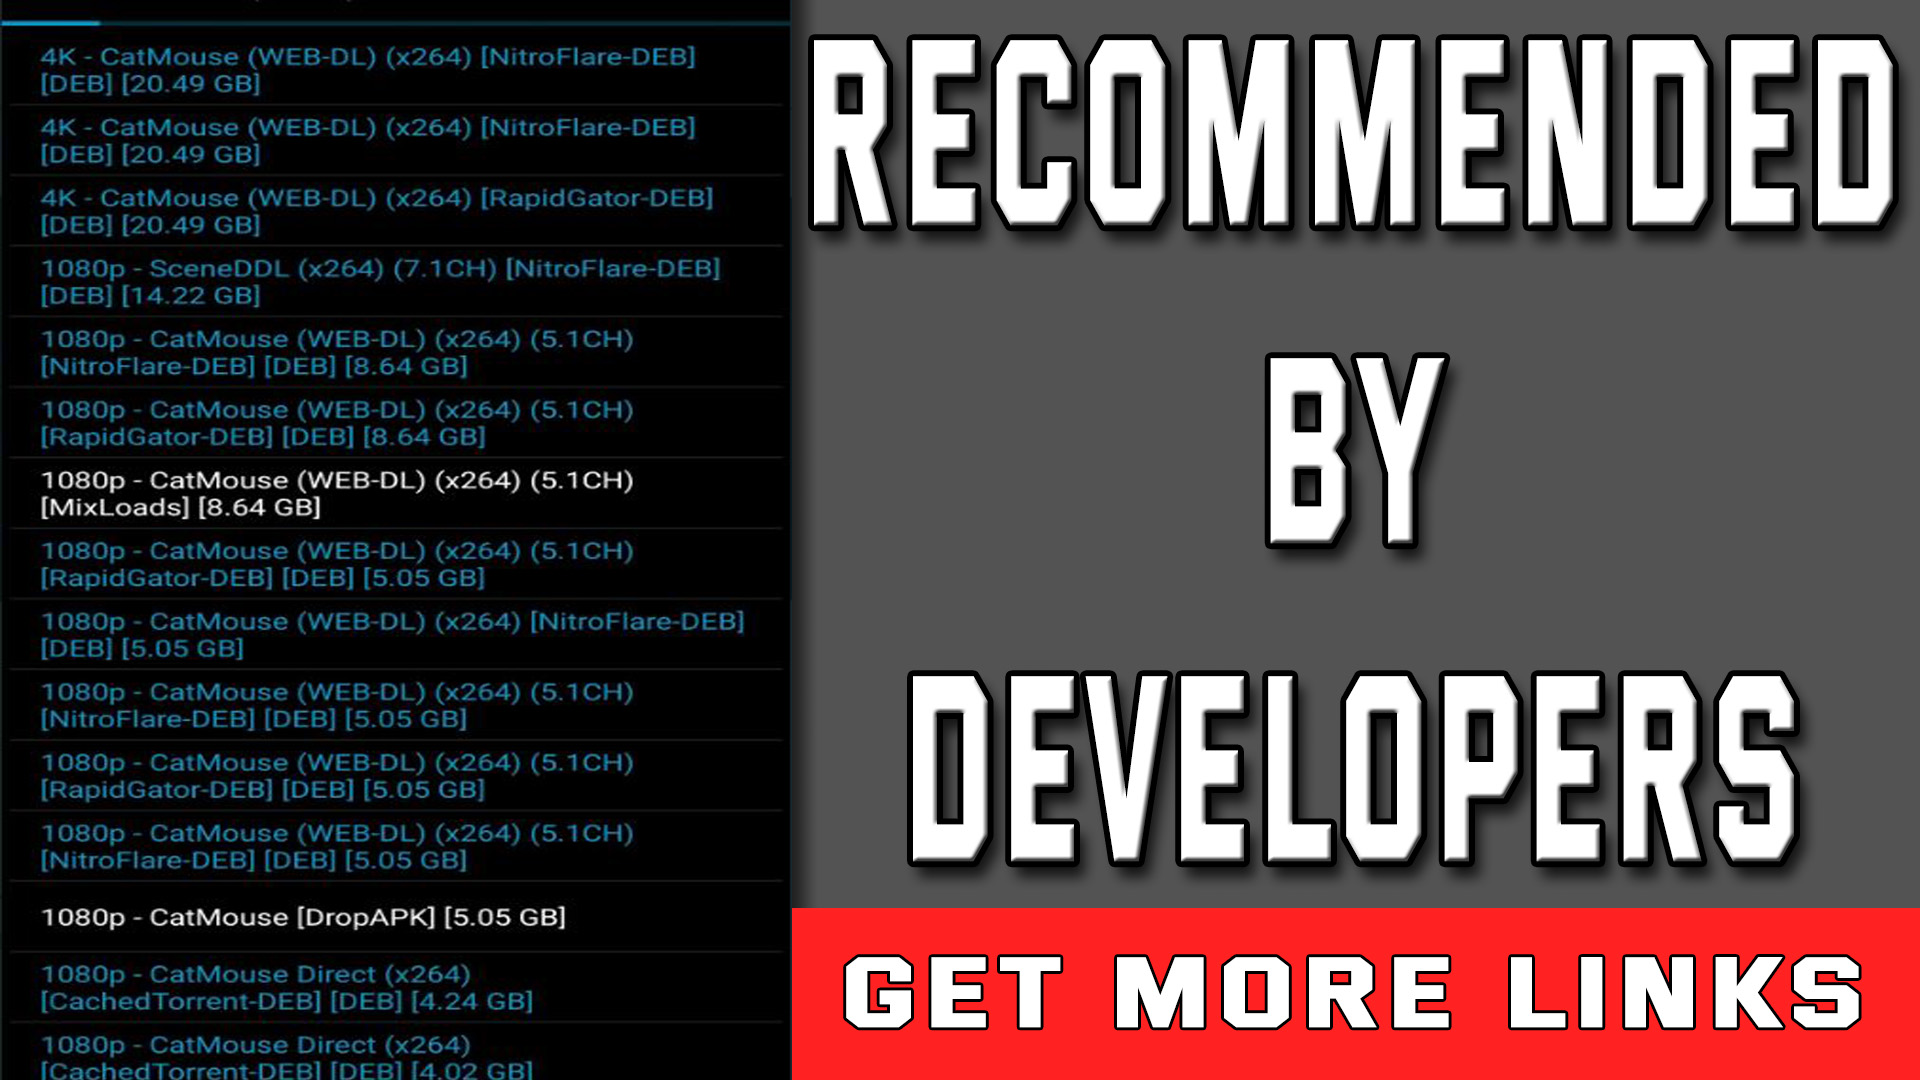 Devlopers urge users to use real debrid